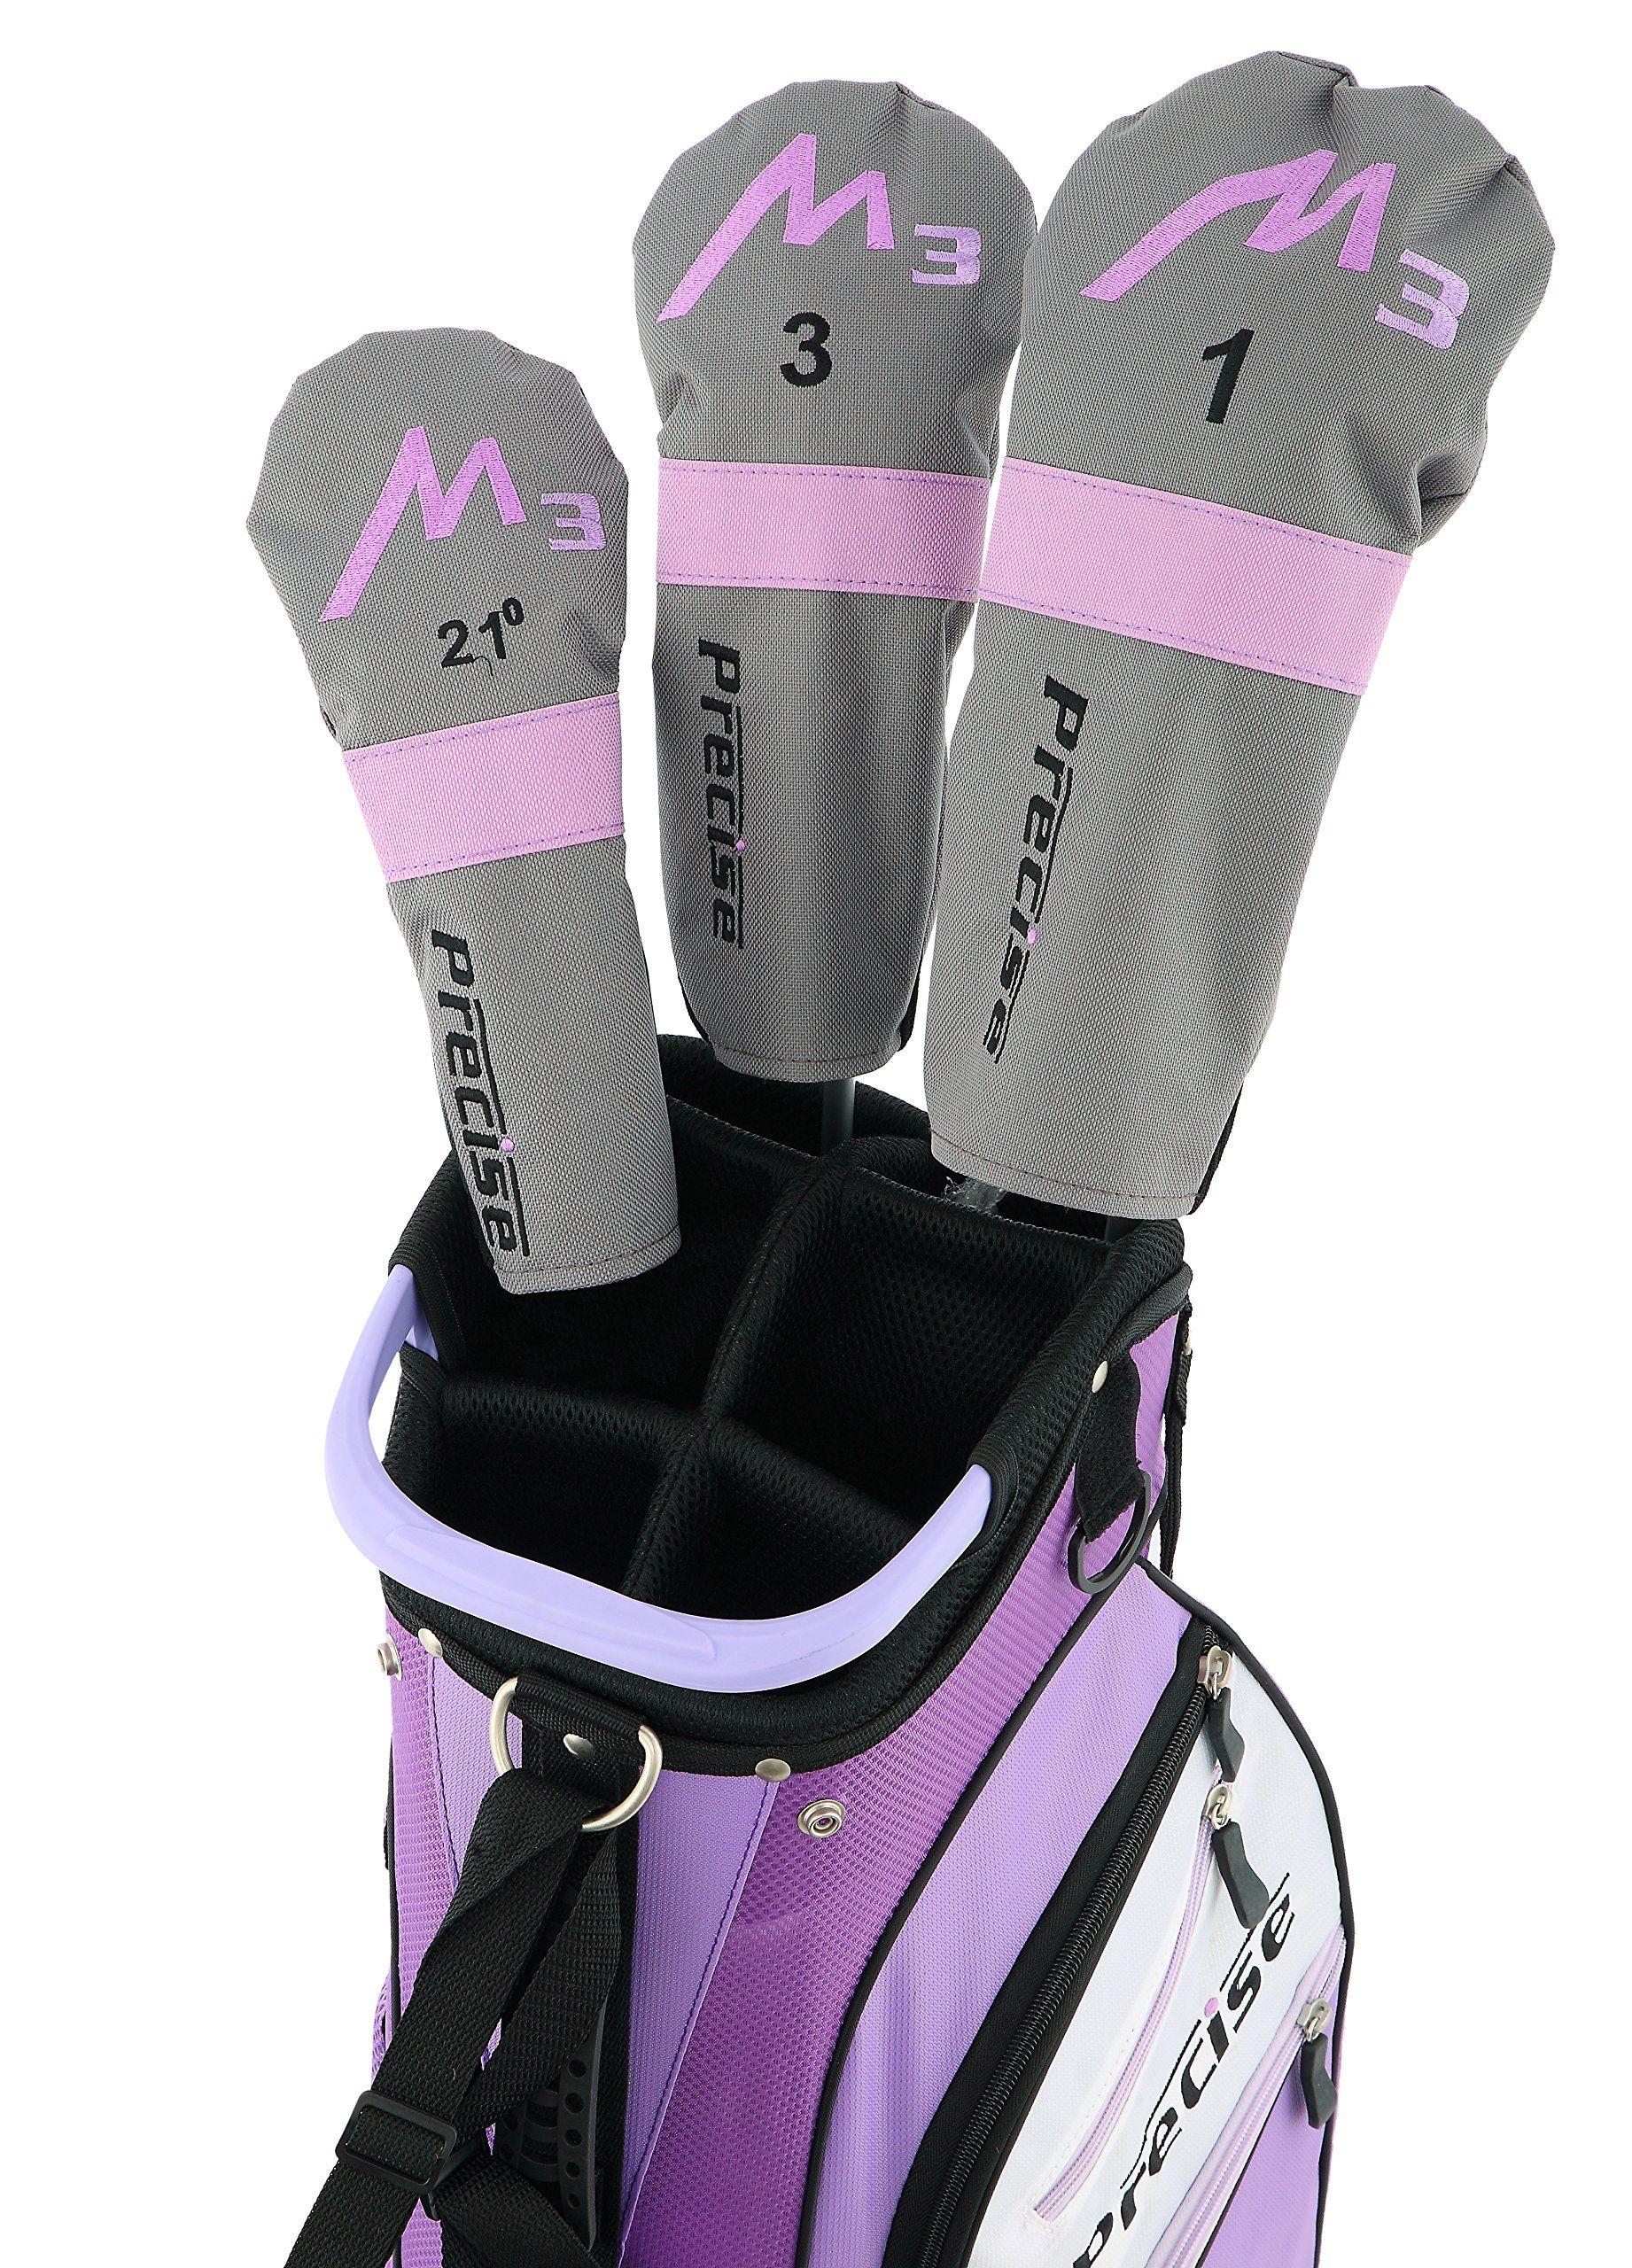 Womens petite golf club set #12